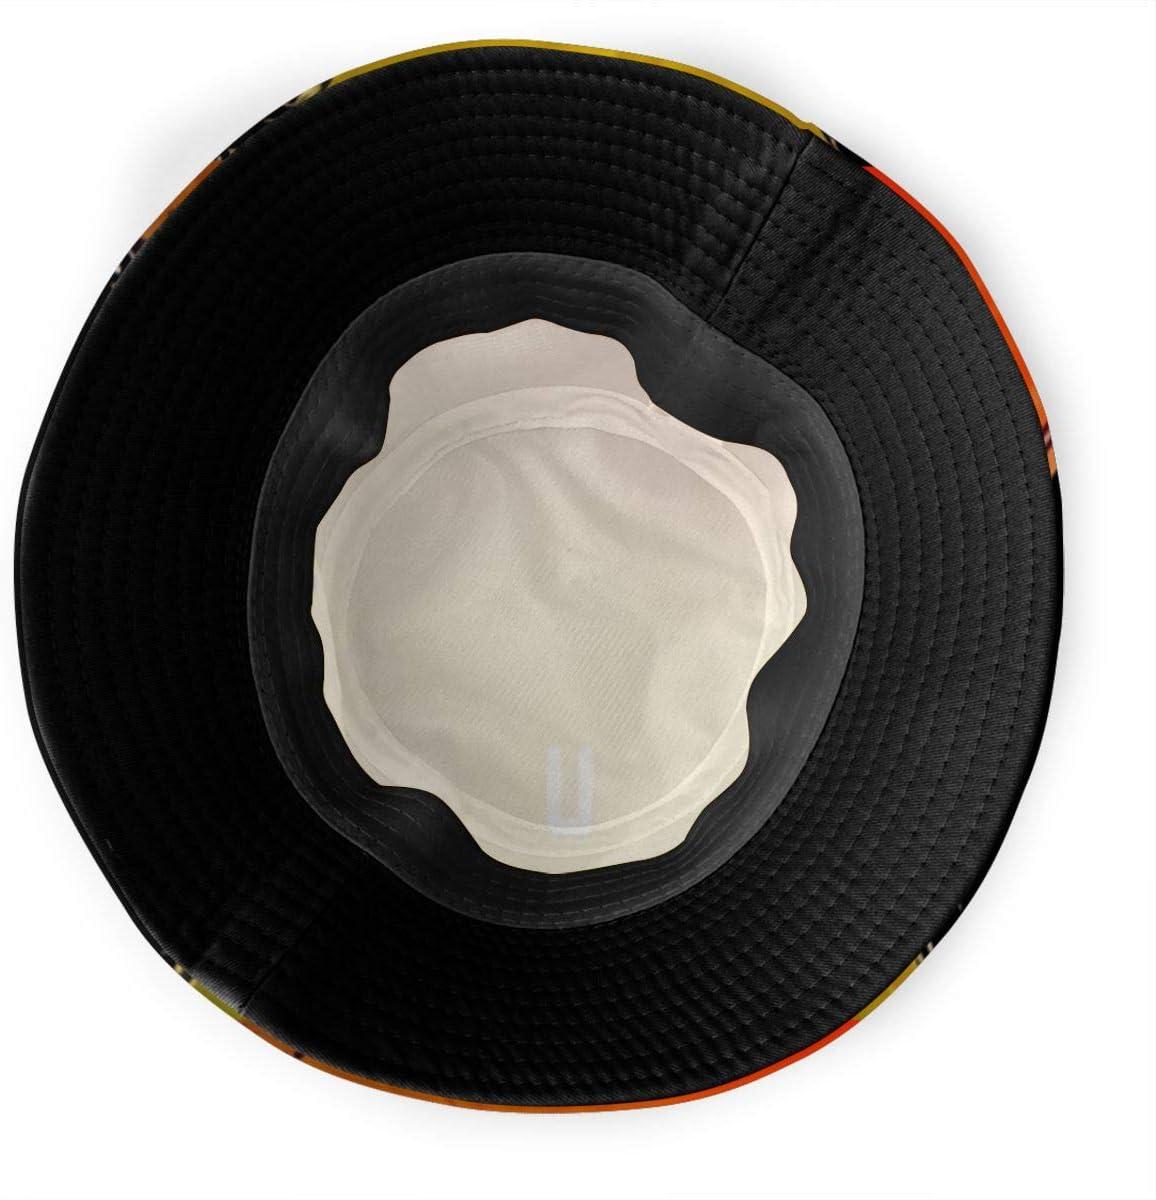 MELISSI Nicky Jam J Balvin X - Gorra para Hombre y Mujer: Amazon ...